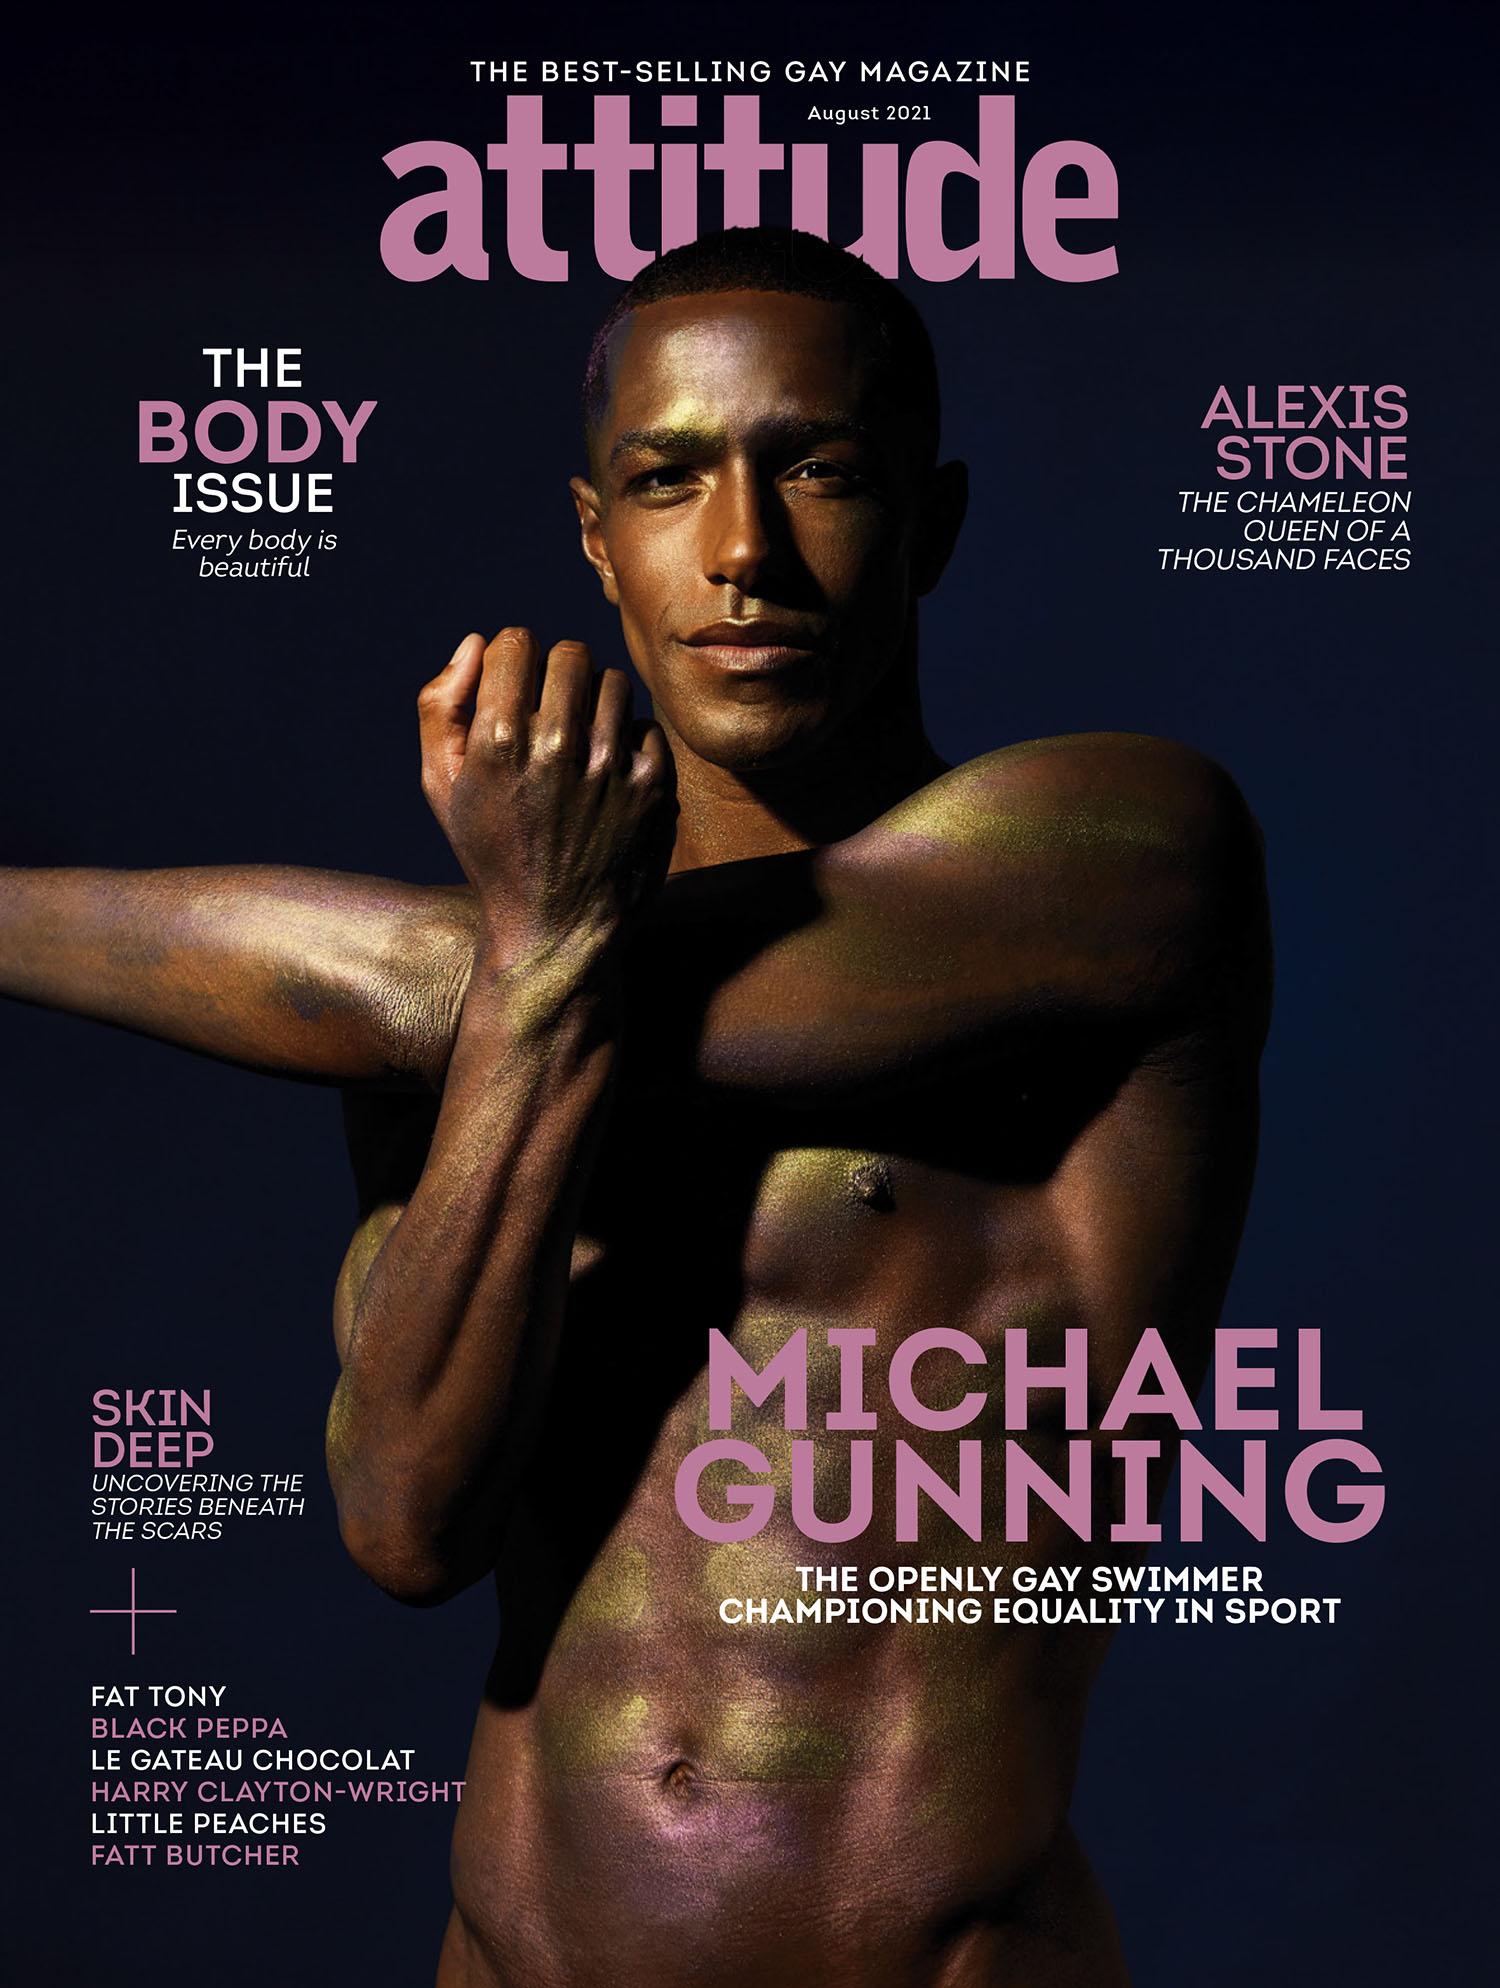 Michael Gunning covers Attitude Magazine August 2021 by Dean Ryan McDaid